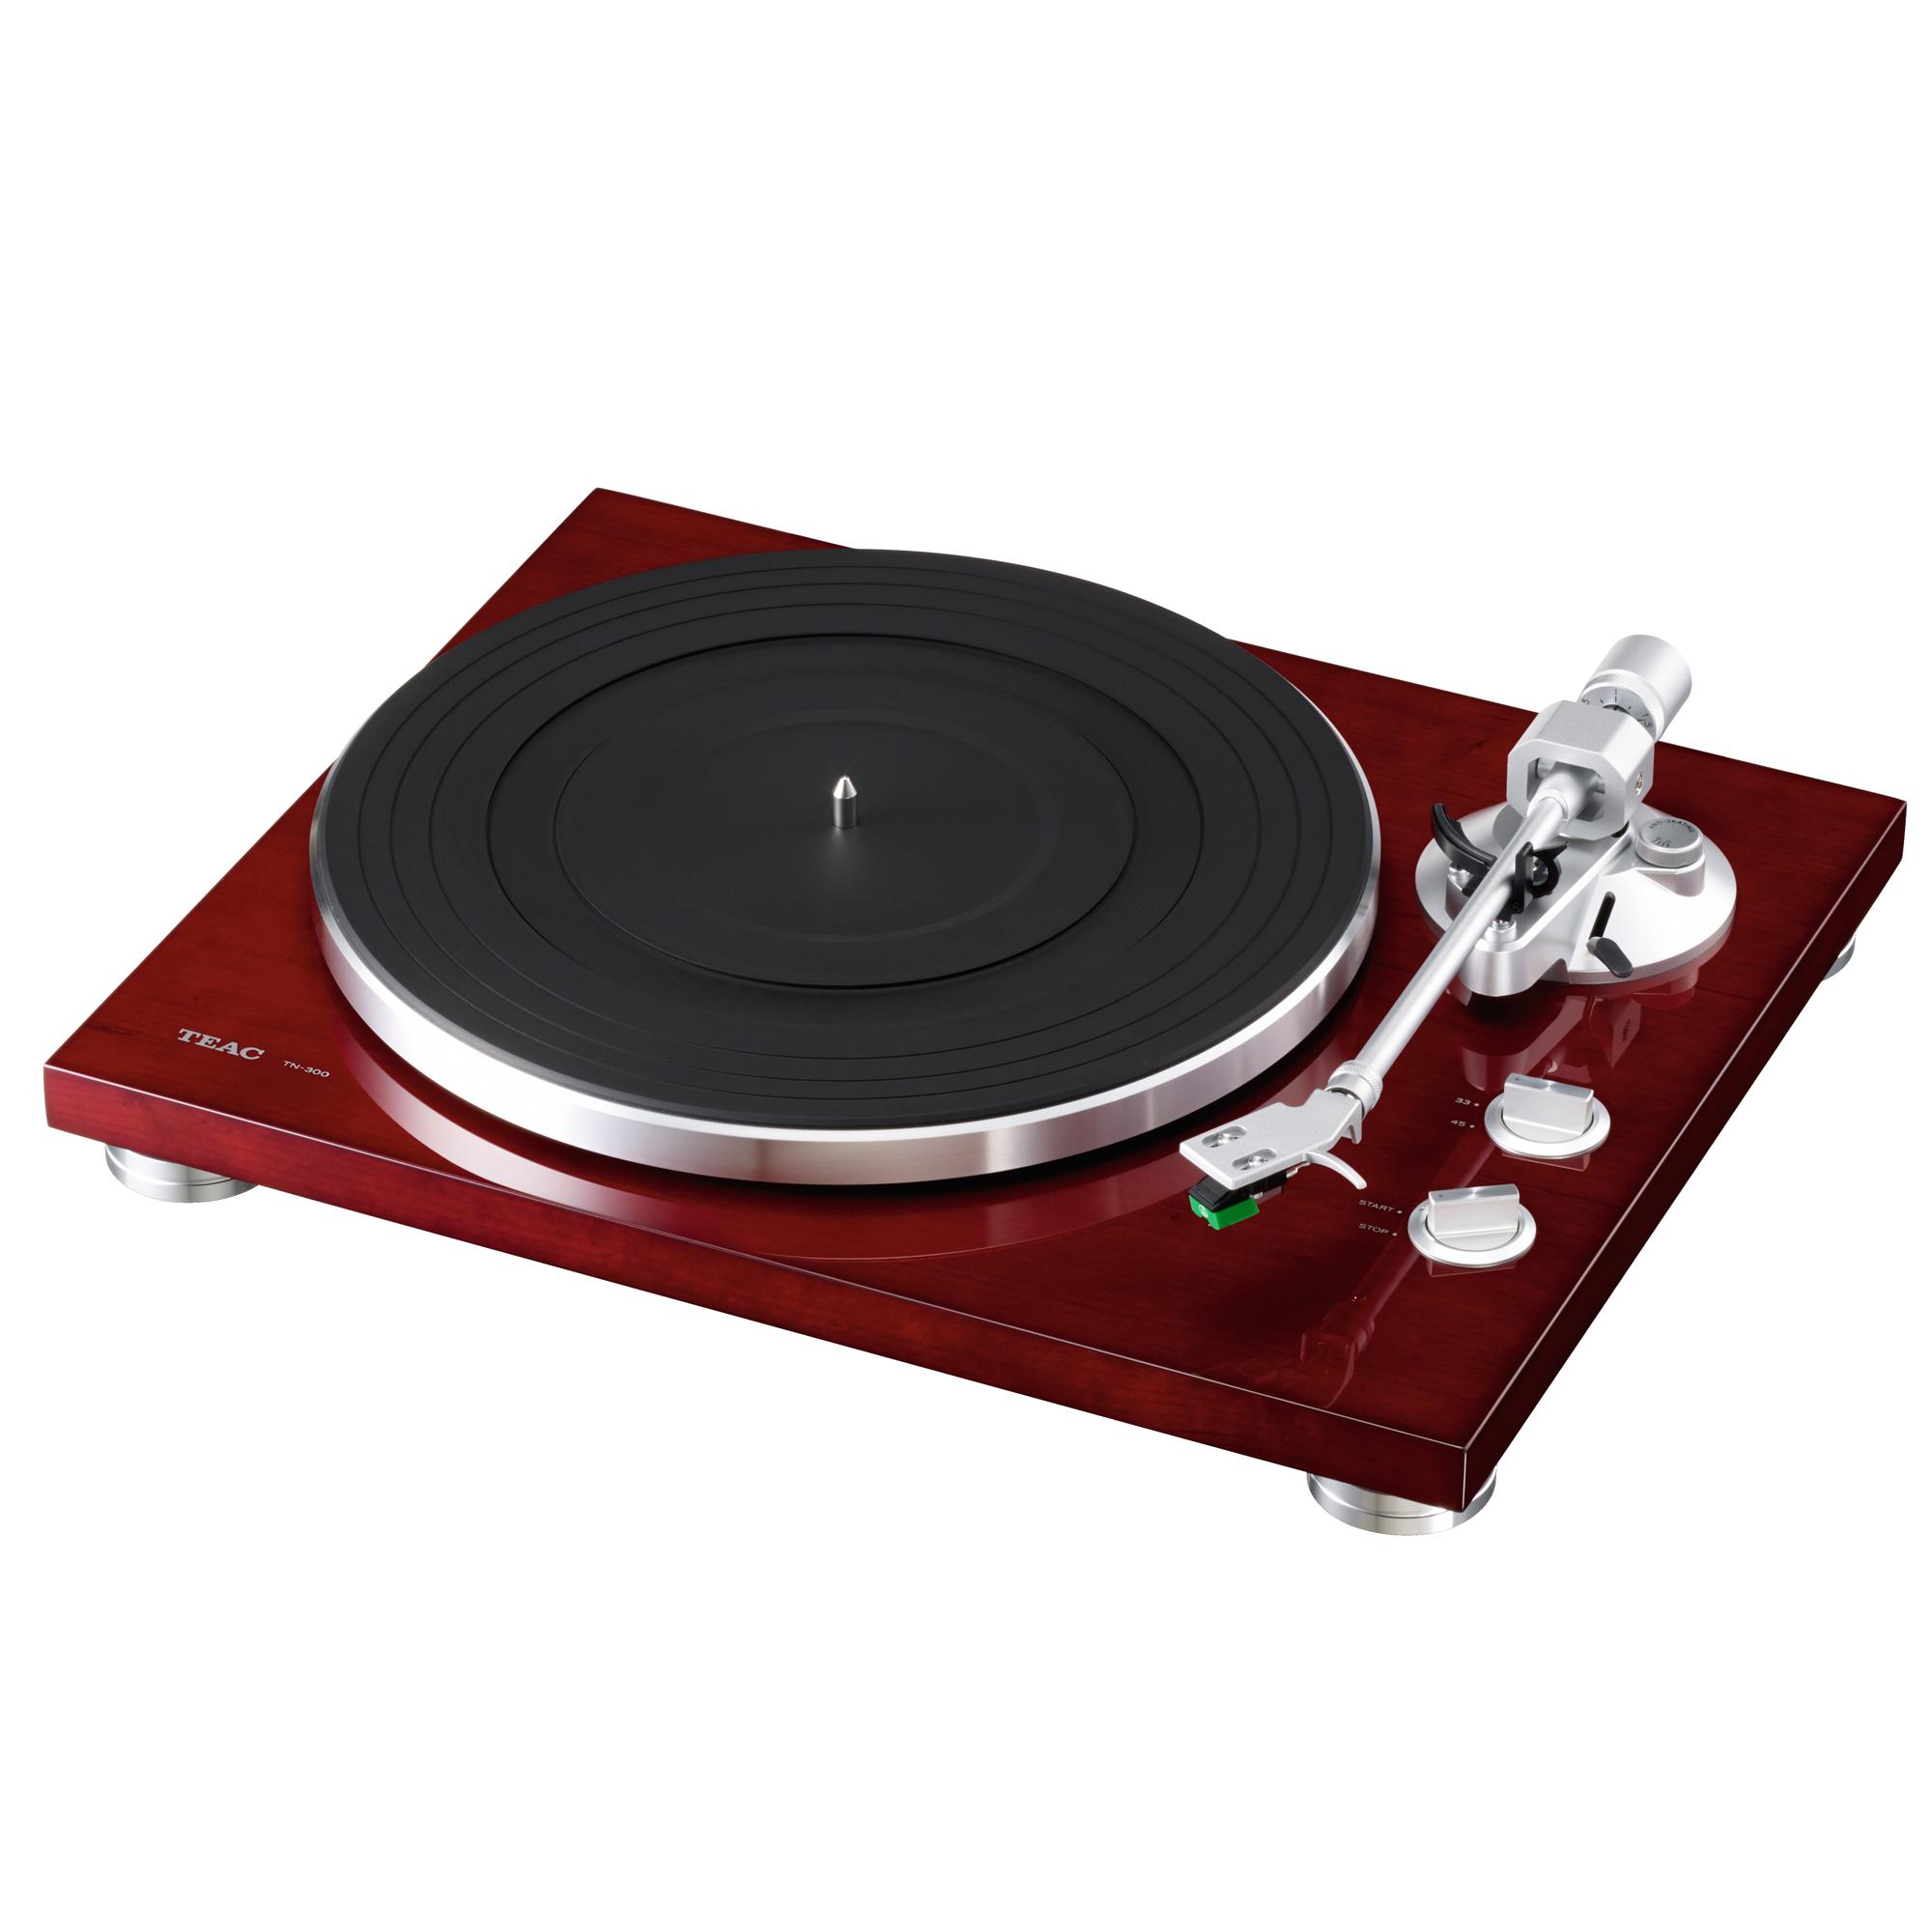 teac tn 300 analogue usb turntable in cherry tekzone